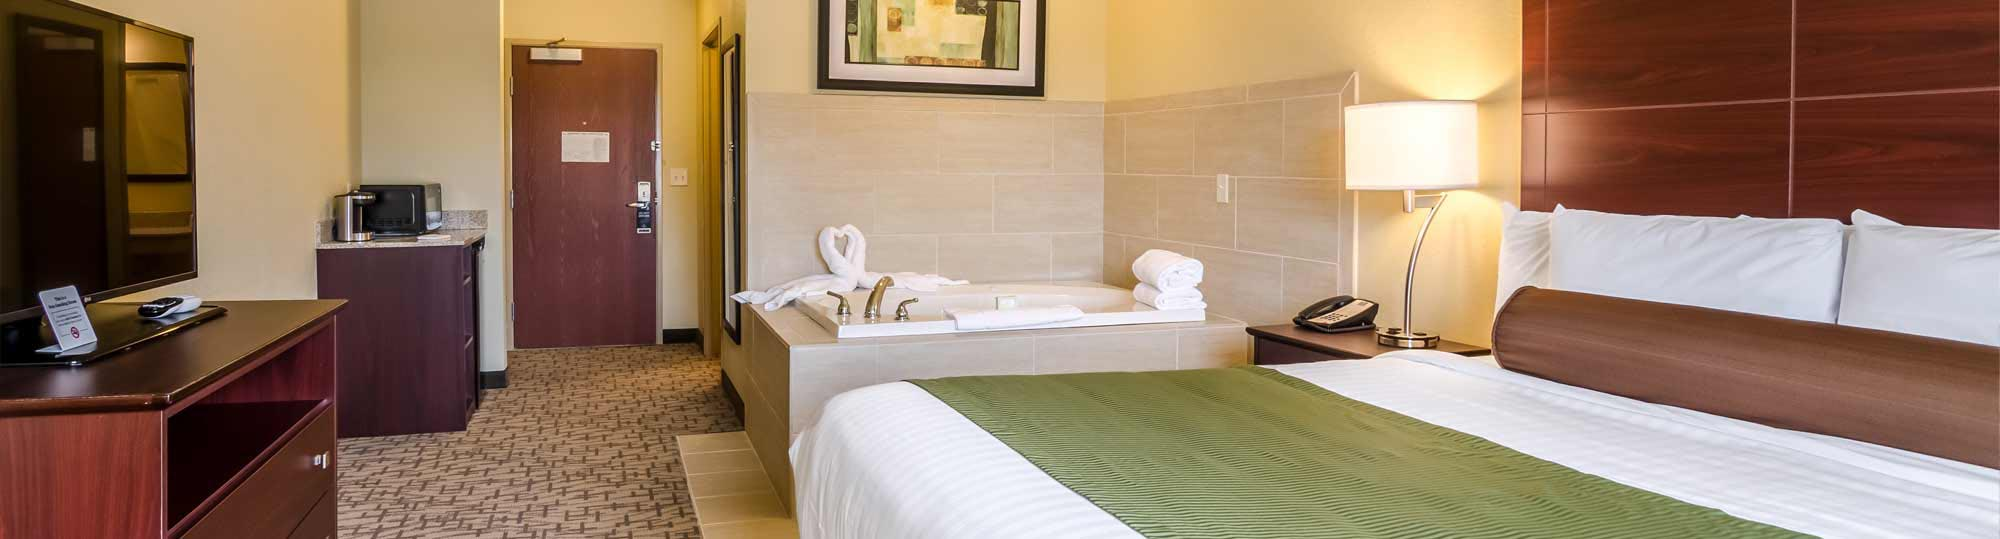 Cobblestone inn and suites in oberlin kansas hotel - Carrie matthews swimming pool decatur al ...